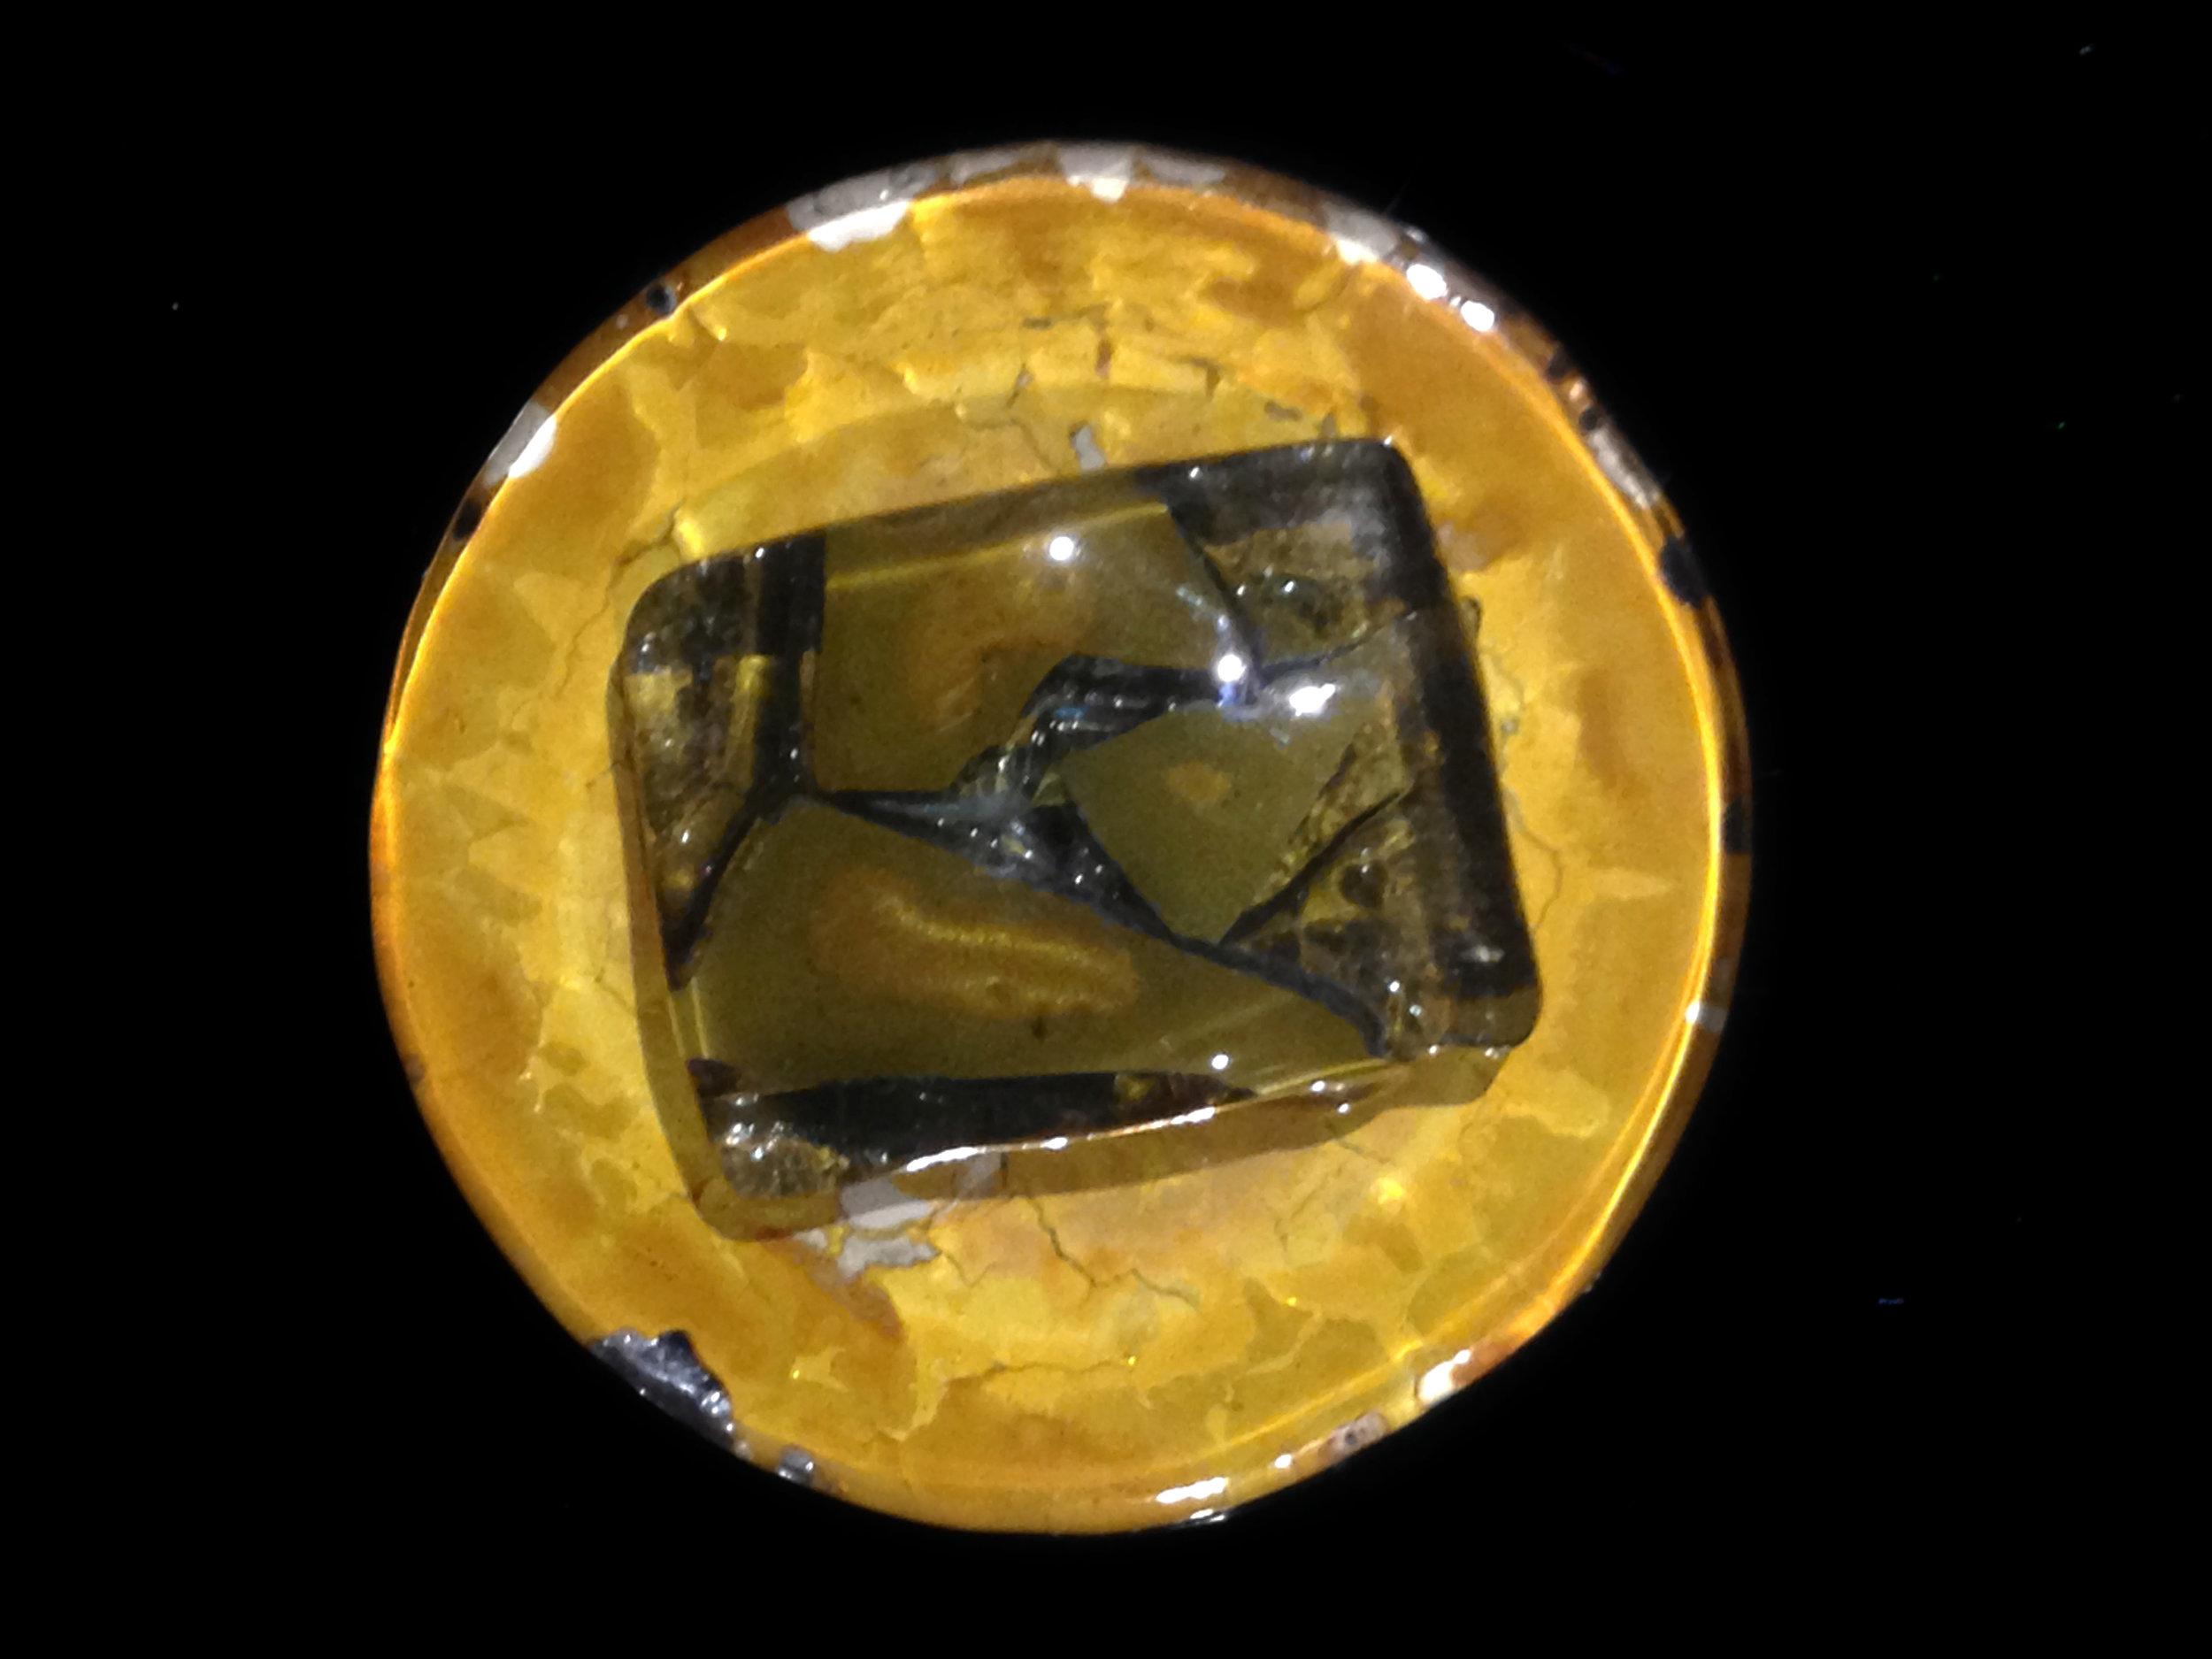 medalha dourada1 (1).jpg